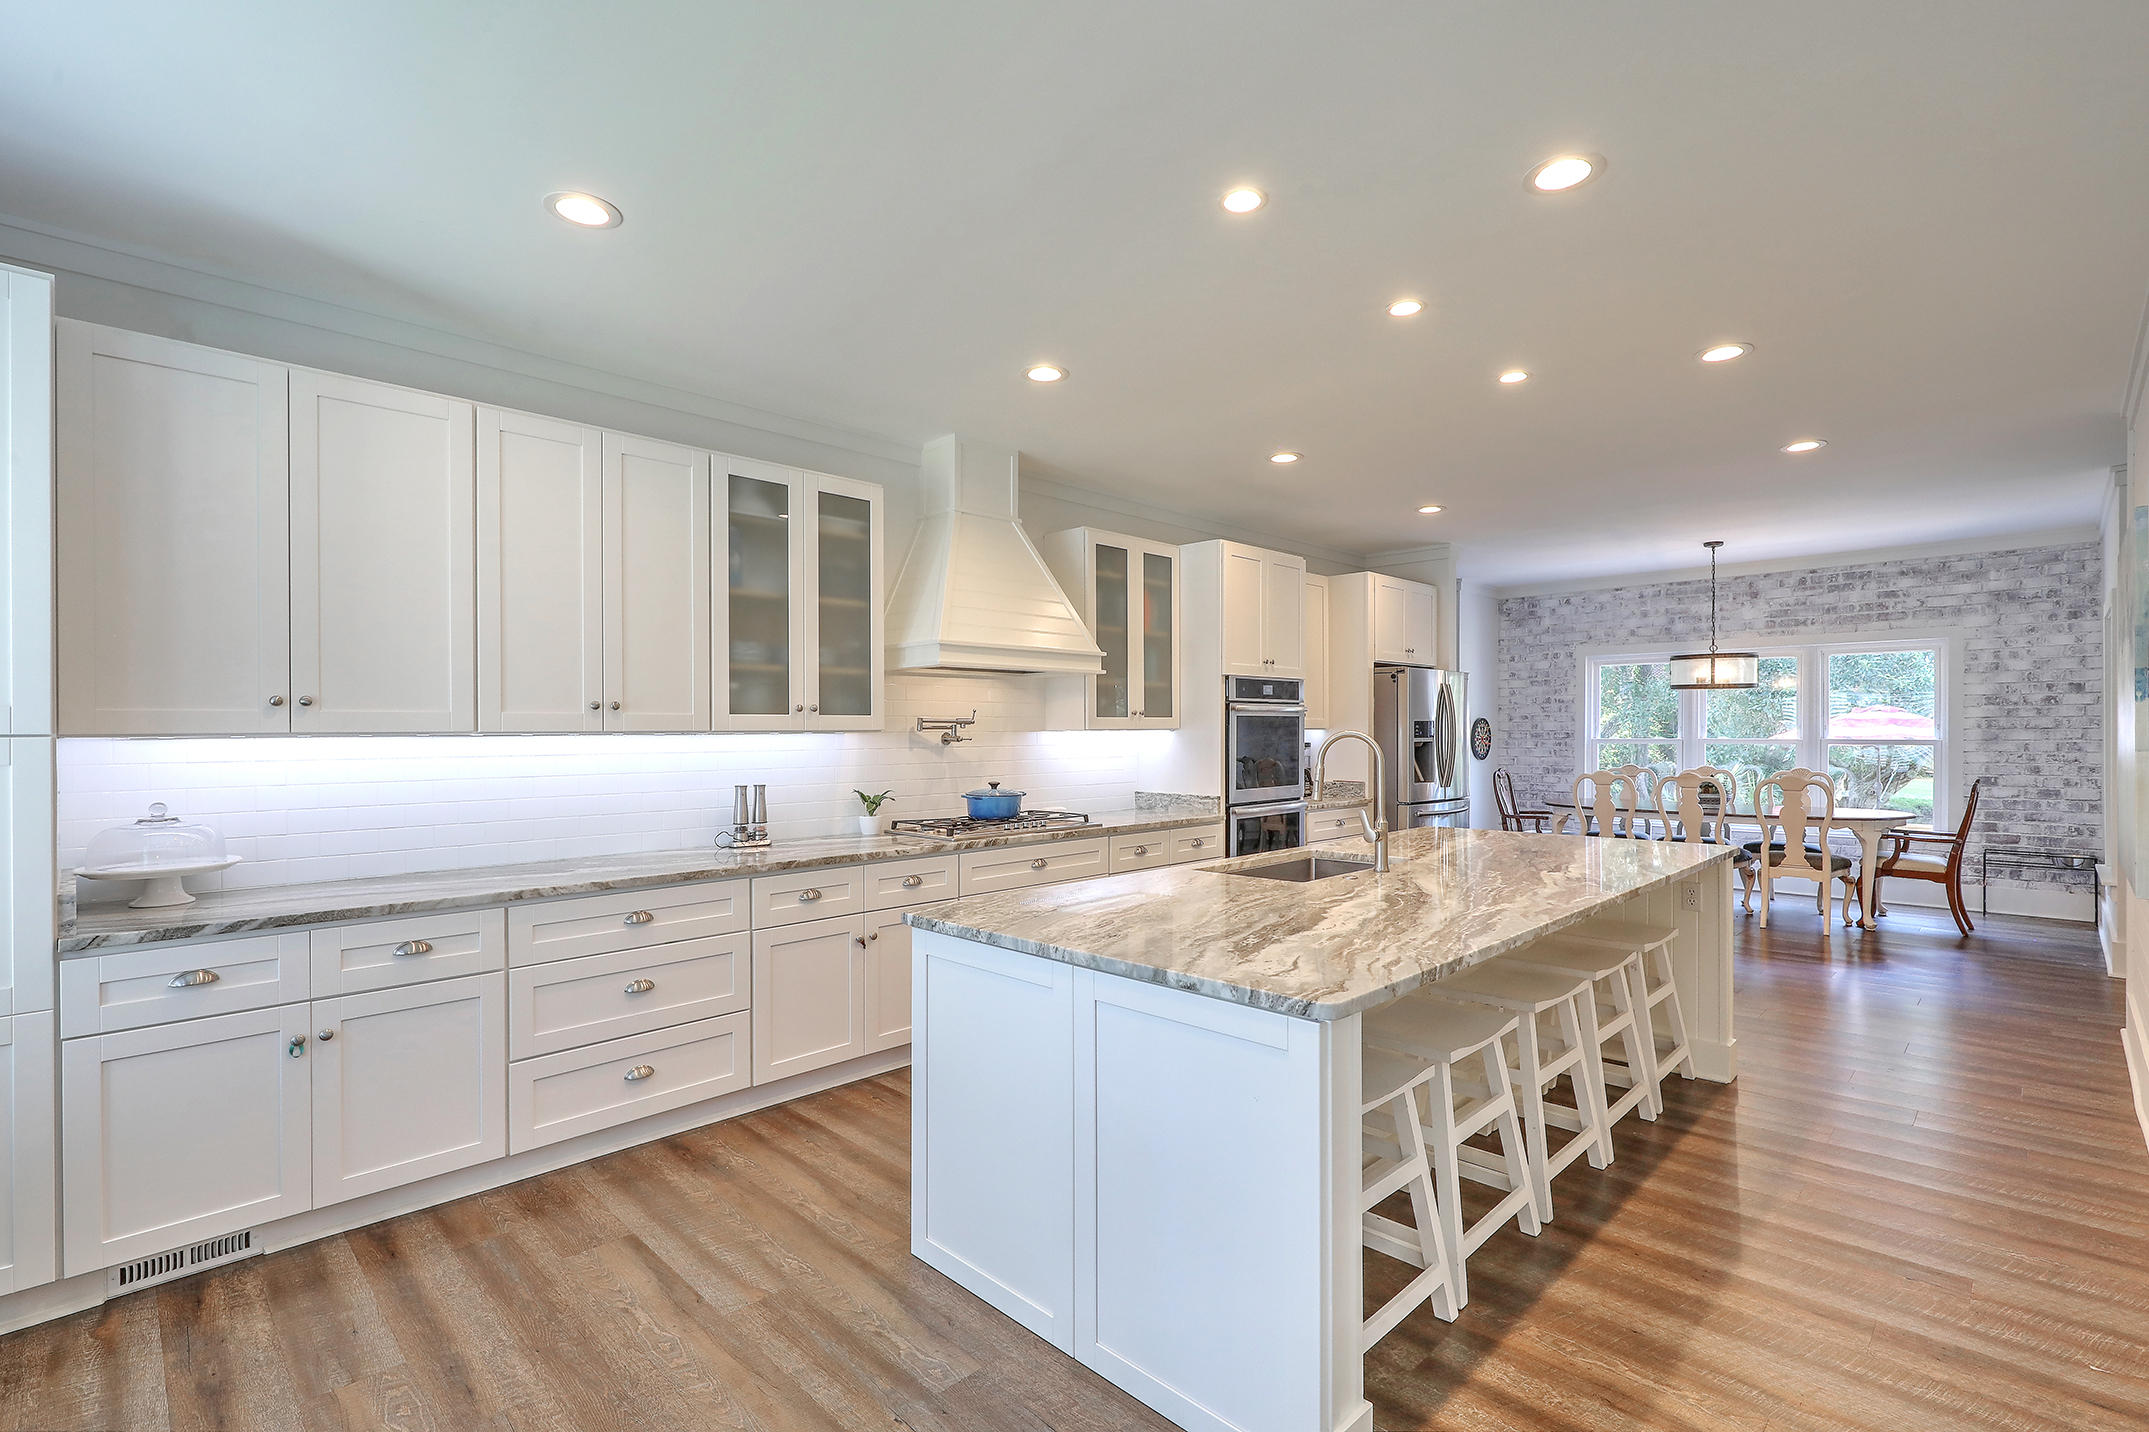 Hobcaw Creek Plantation Homes For Sale - 619 Palisades, Mount Pleasant, SC - 47